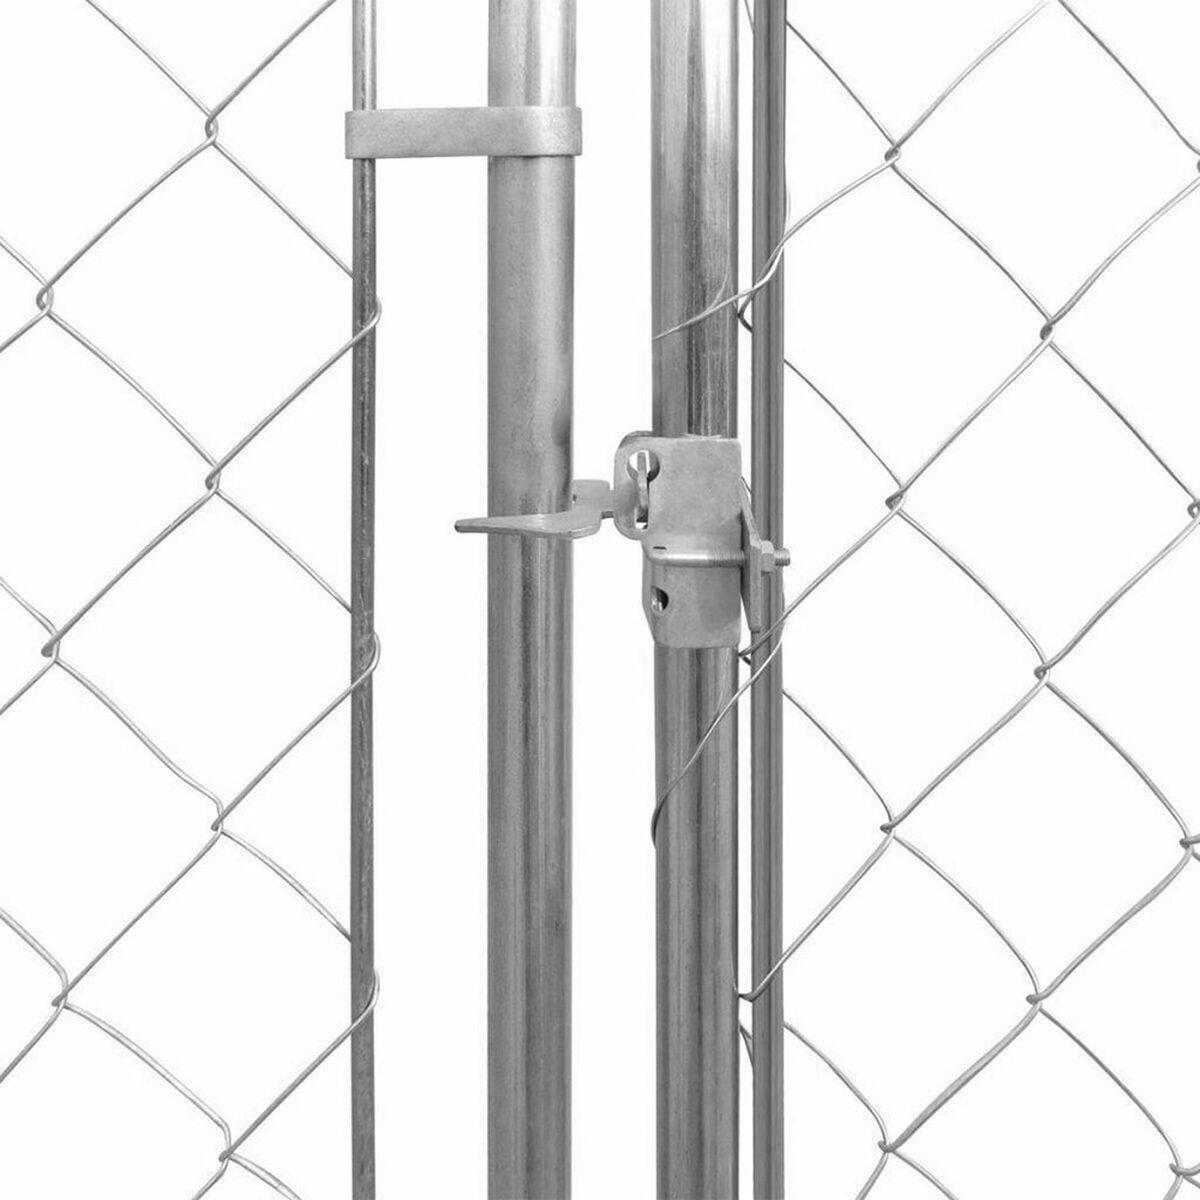 Canil Modular Northwest Para Perros 4X2 Mts. Con Techo